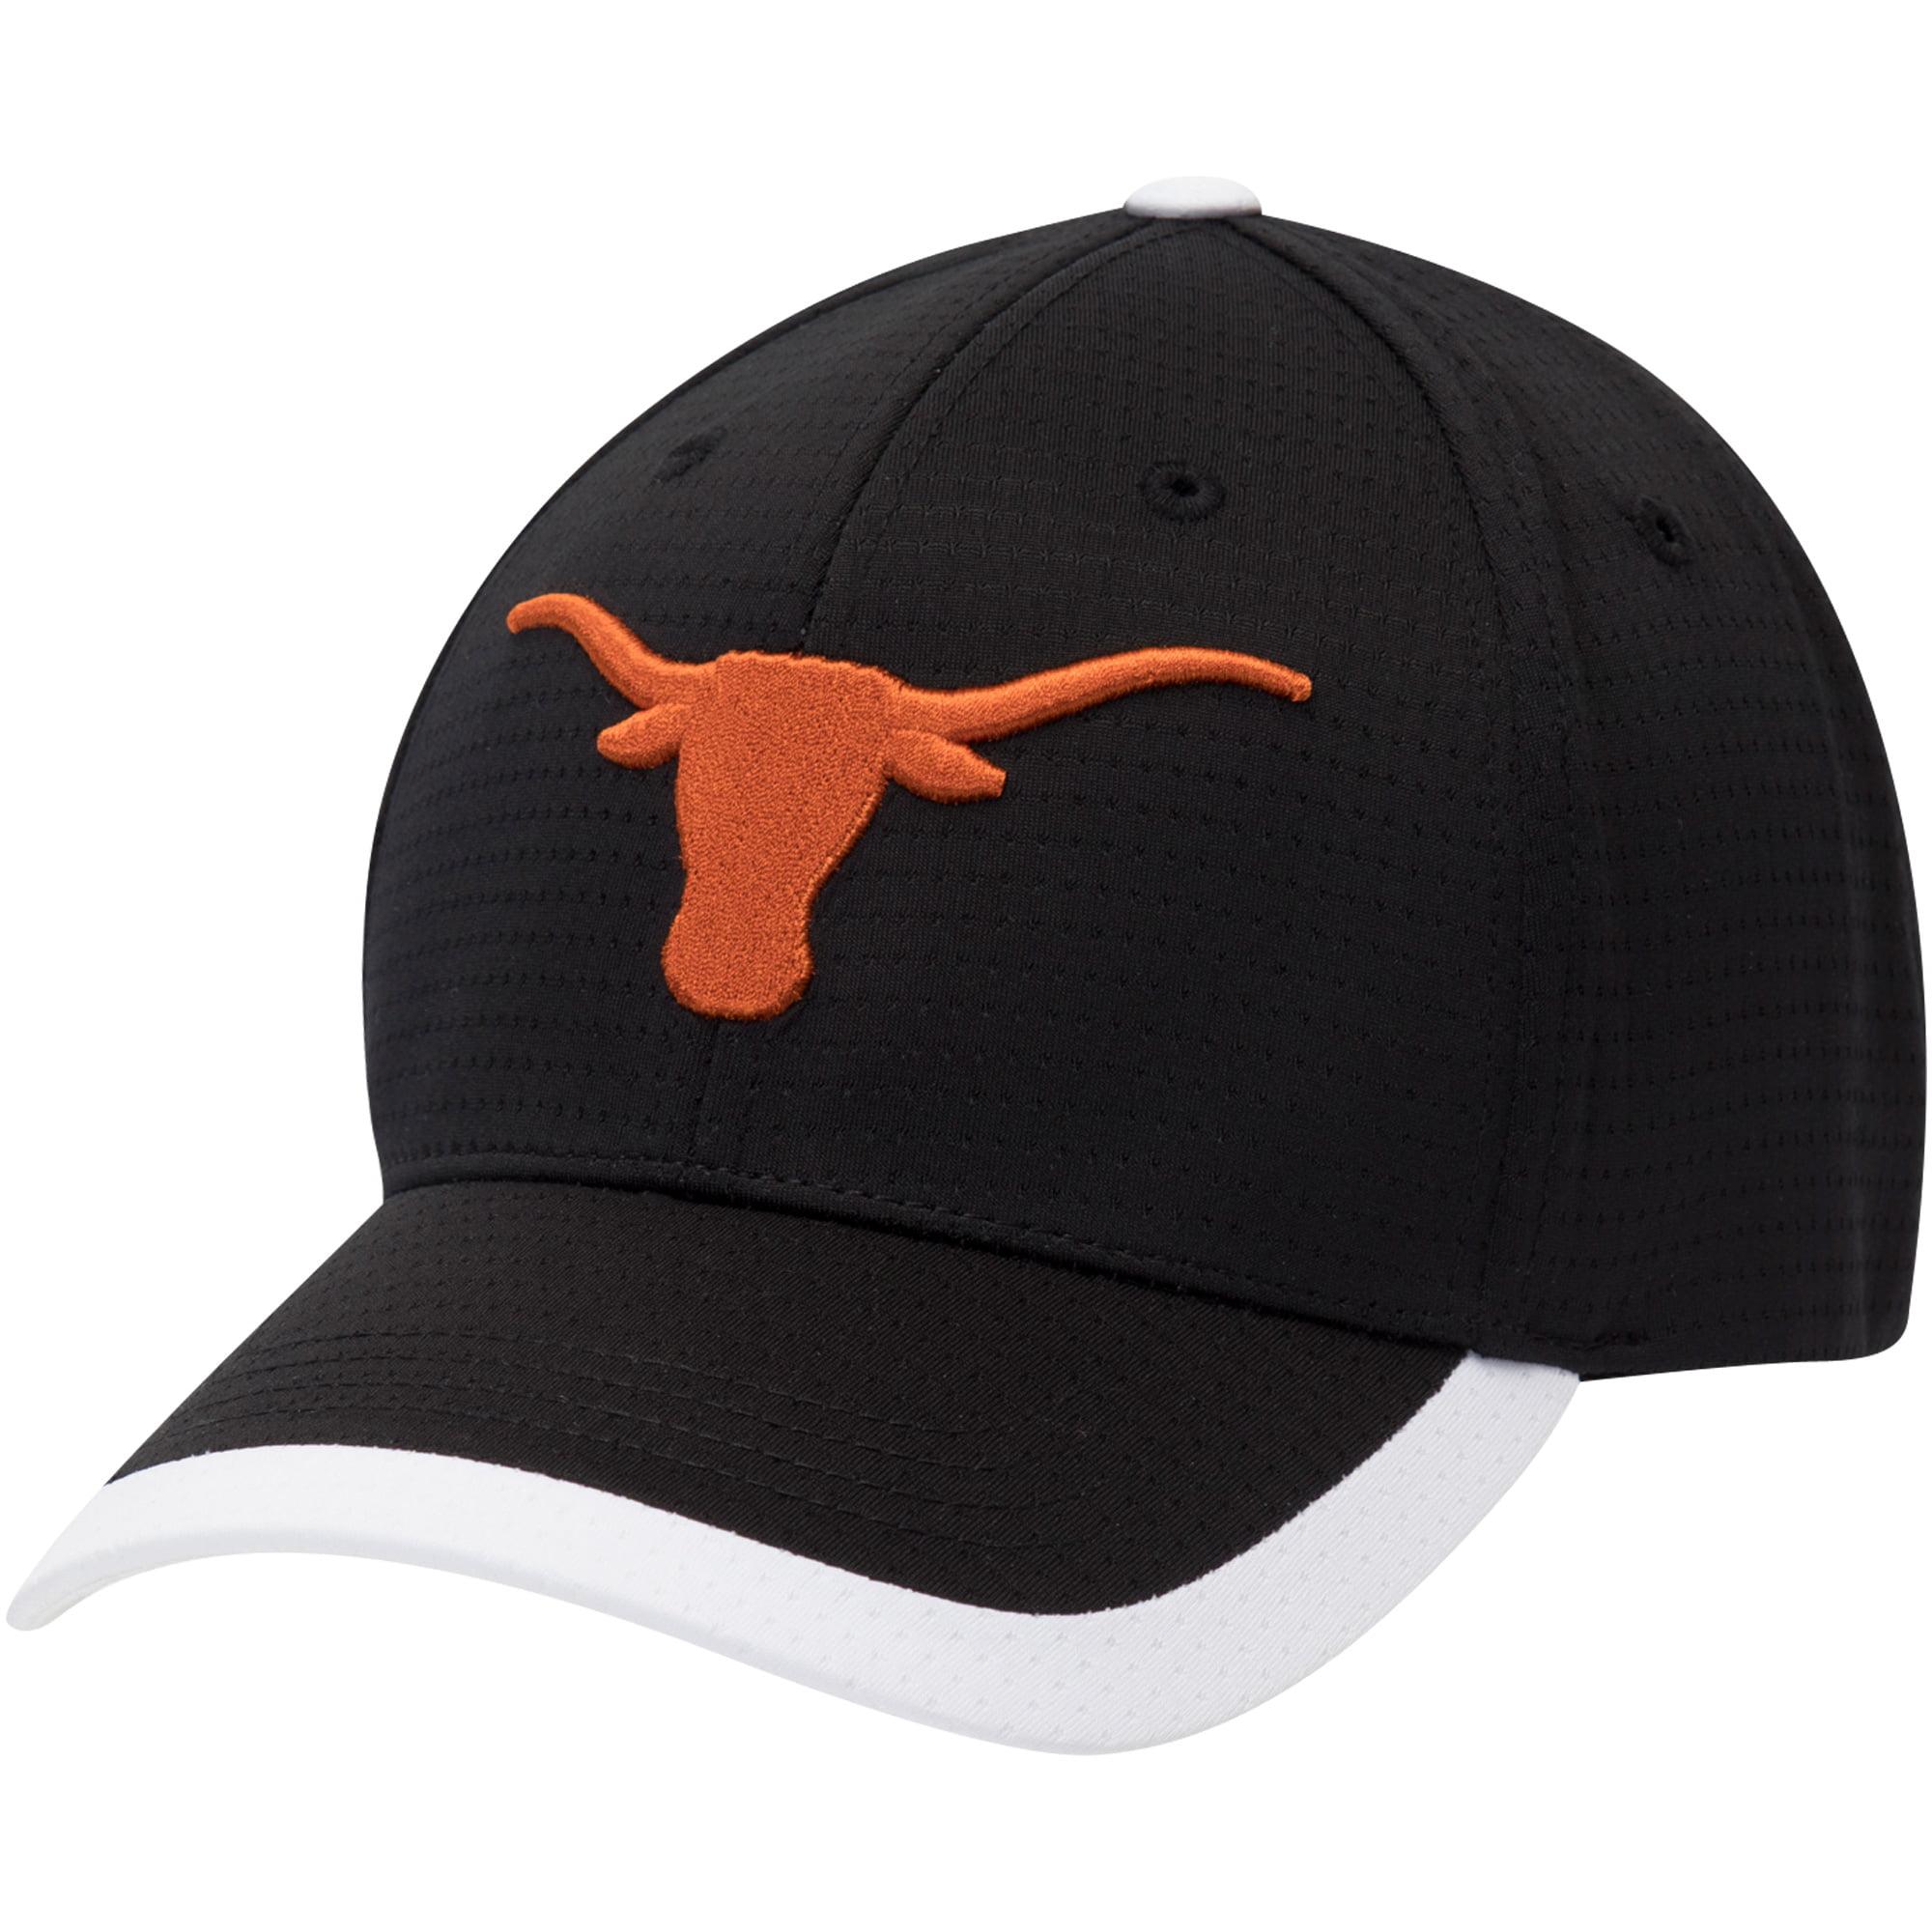 Men s Black Texas Longhorns Dunlap Adjustable Hat - OSFA - Walmart.com 57712dabe7d2